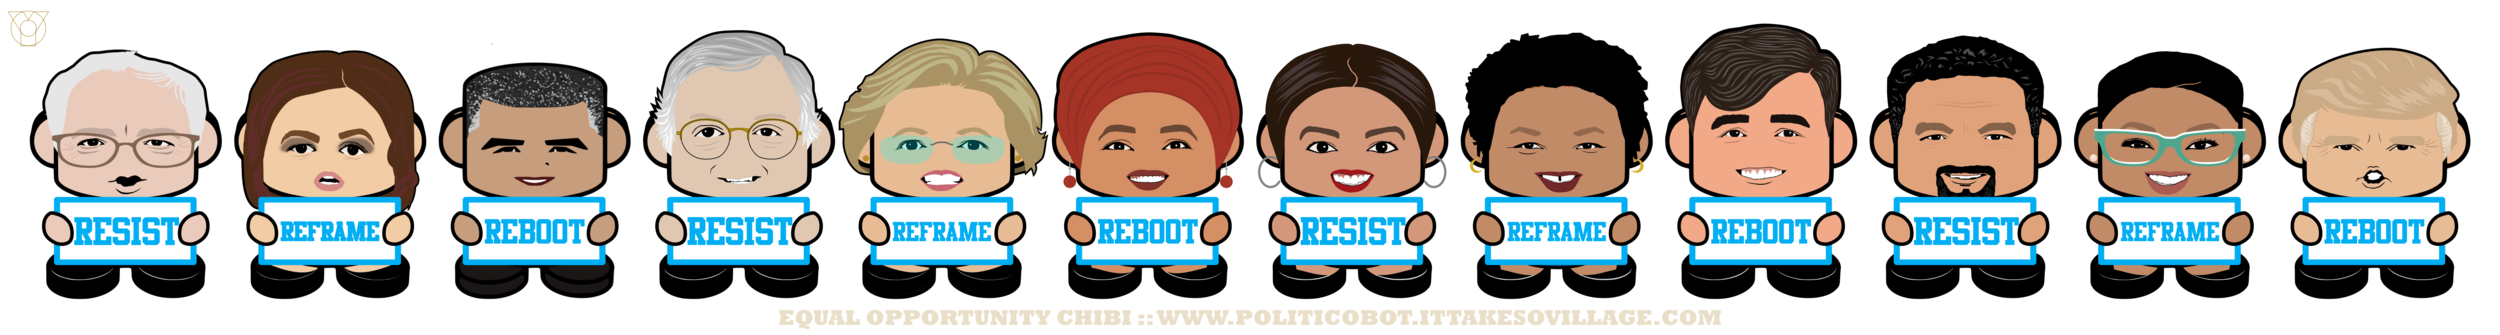 carbonfibreme_obots_politicobots_resist_collective.png